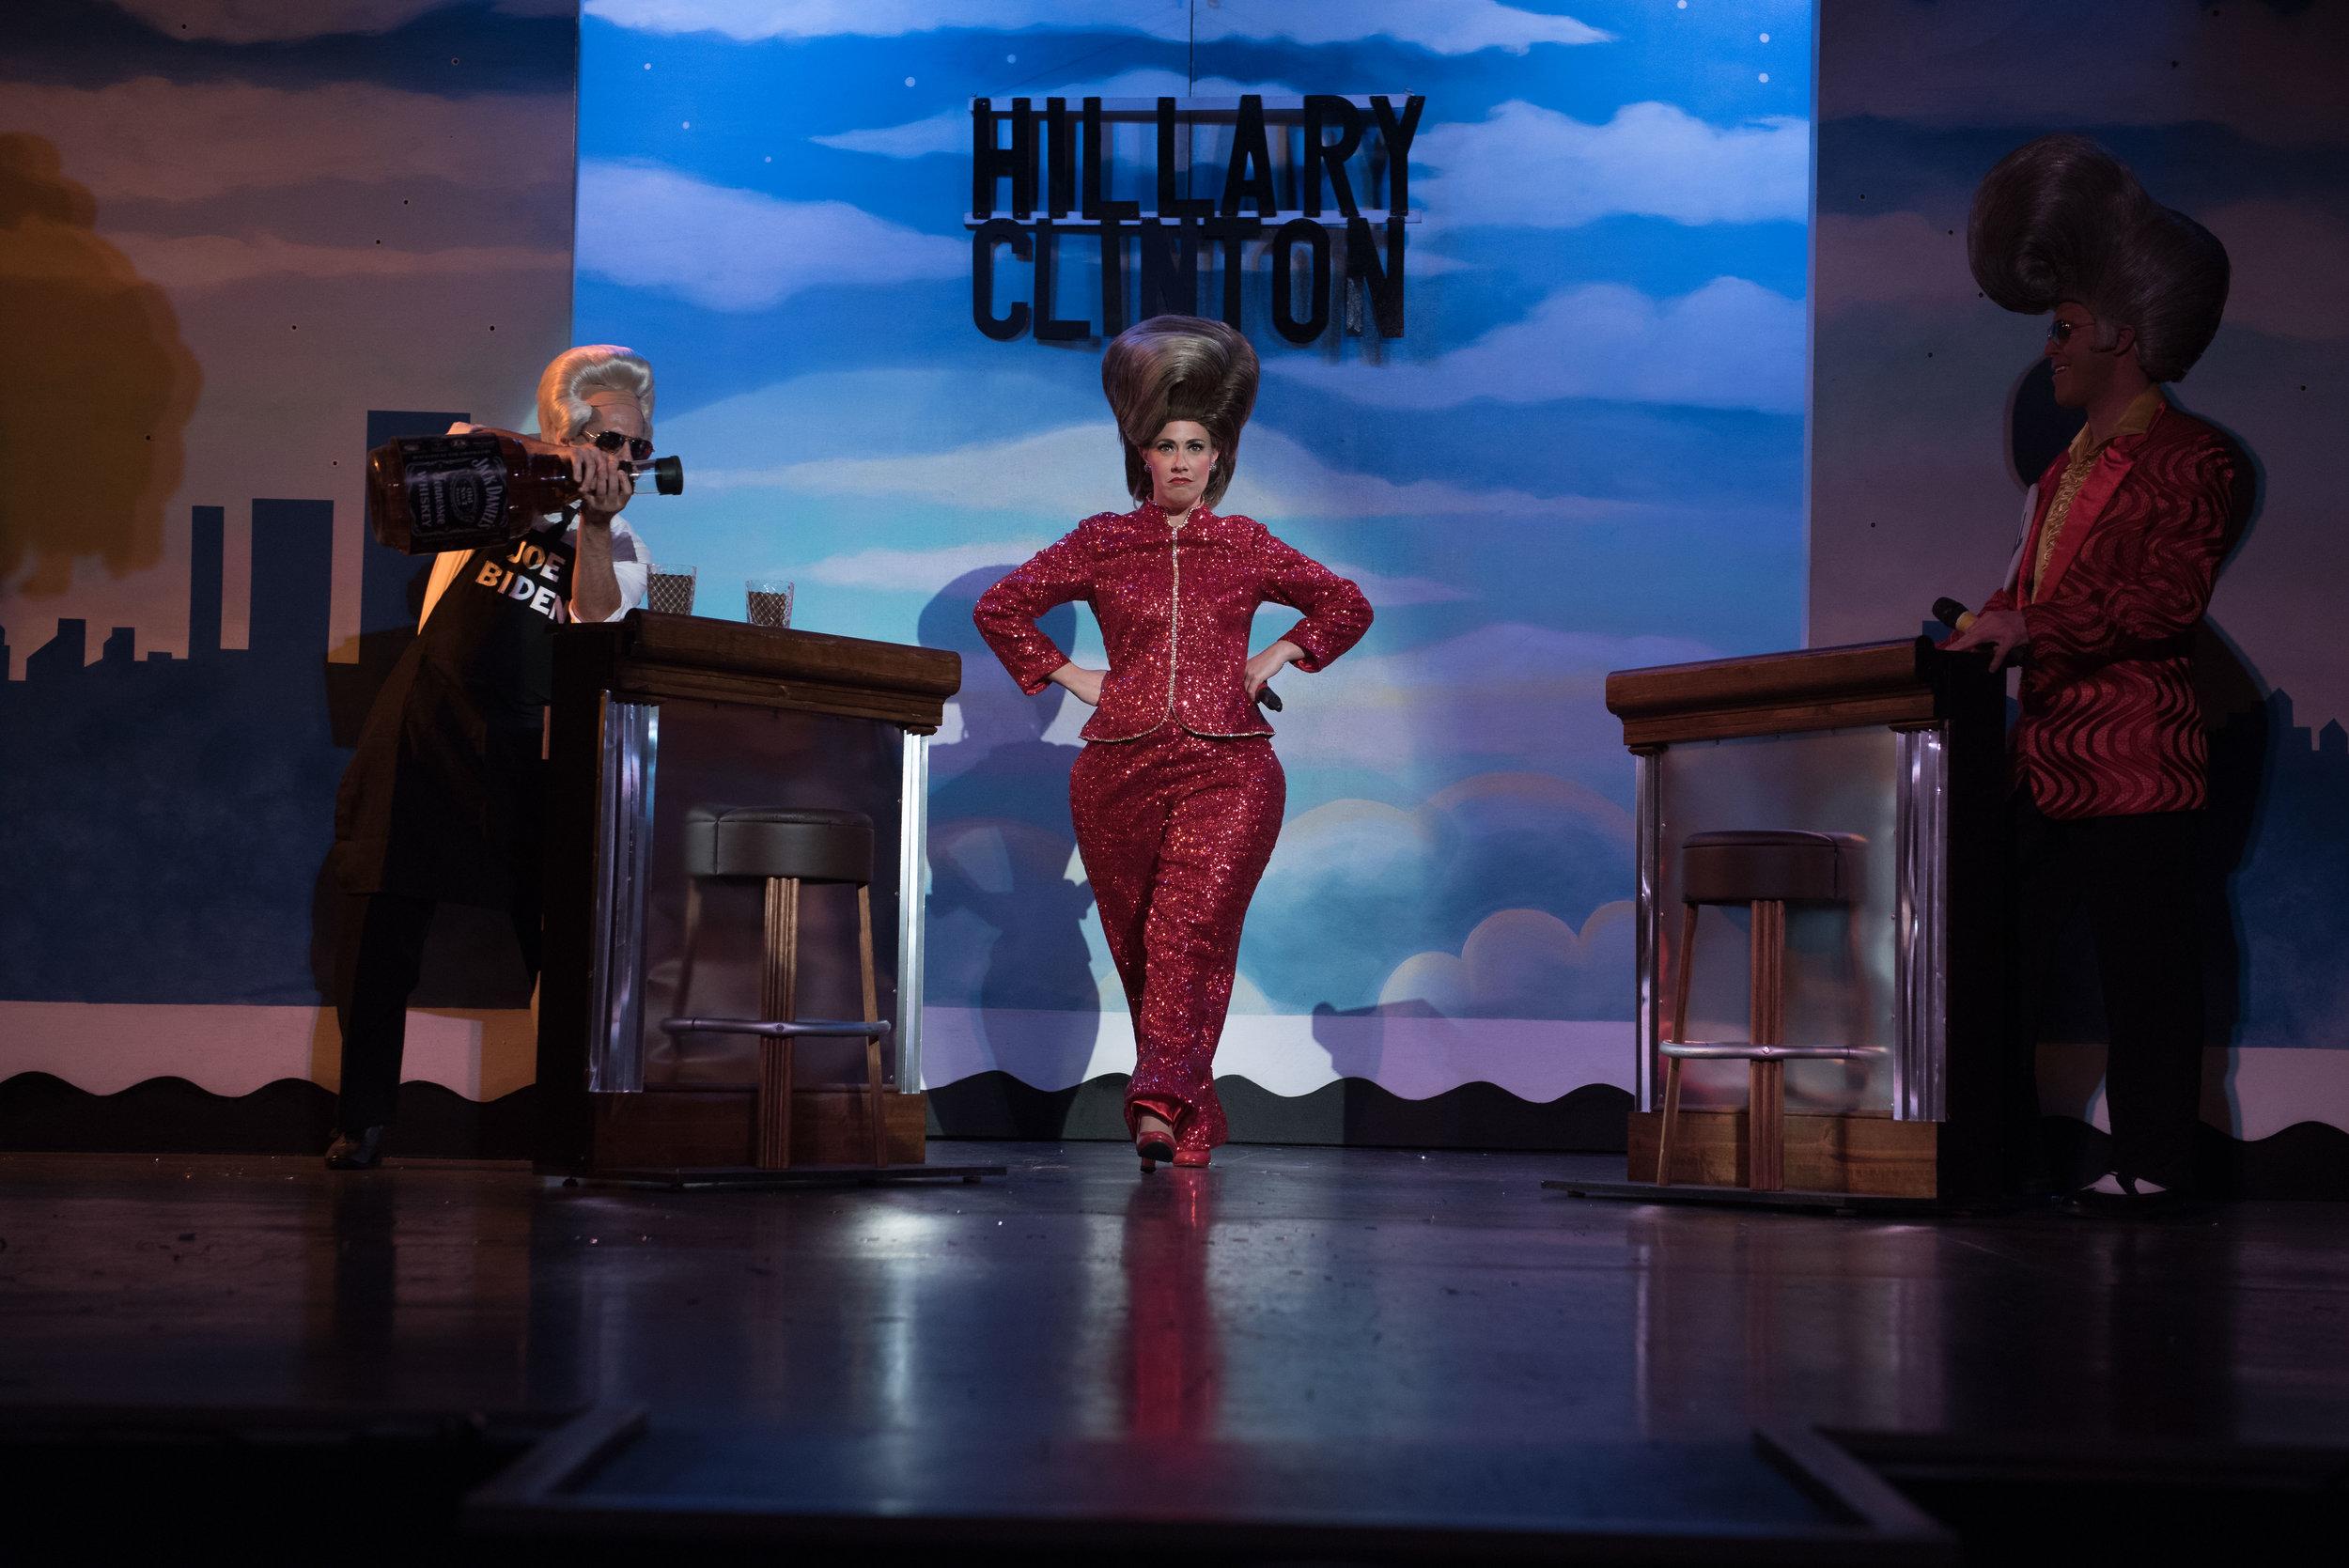 Hillary Clinton | Photo credit: Rick Markovich